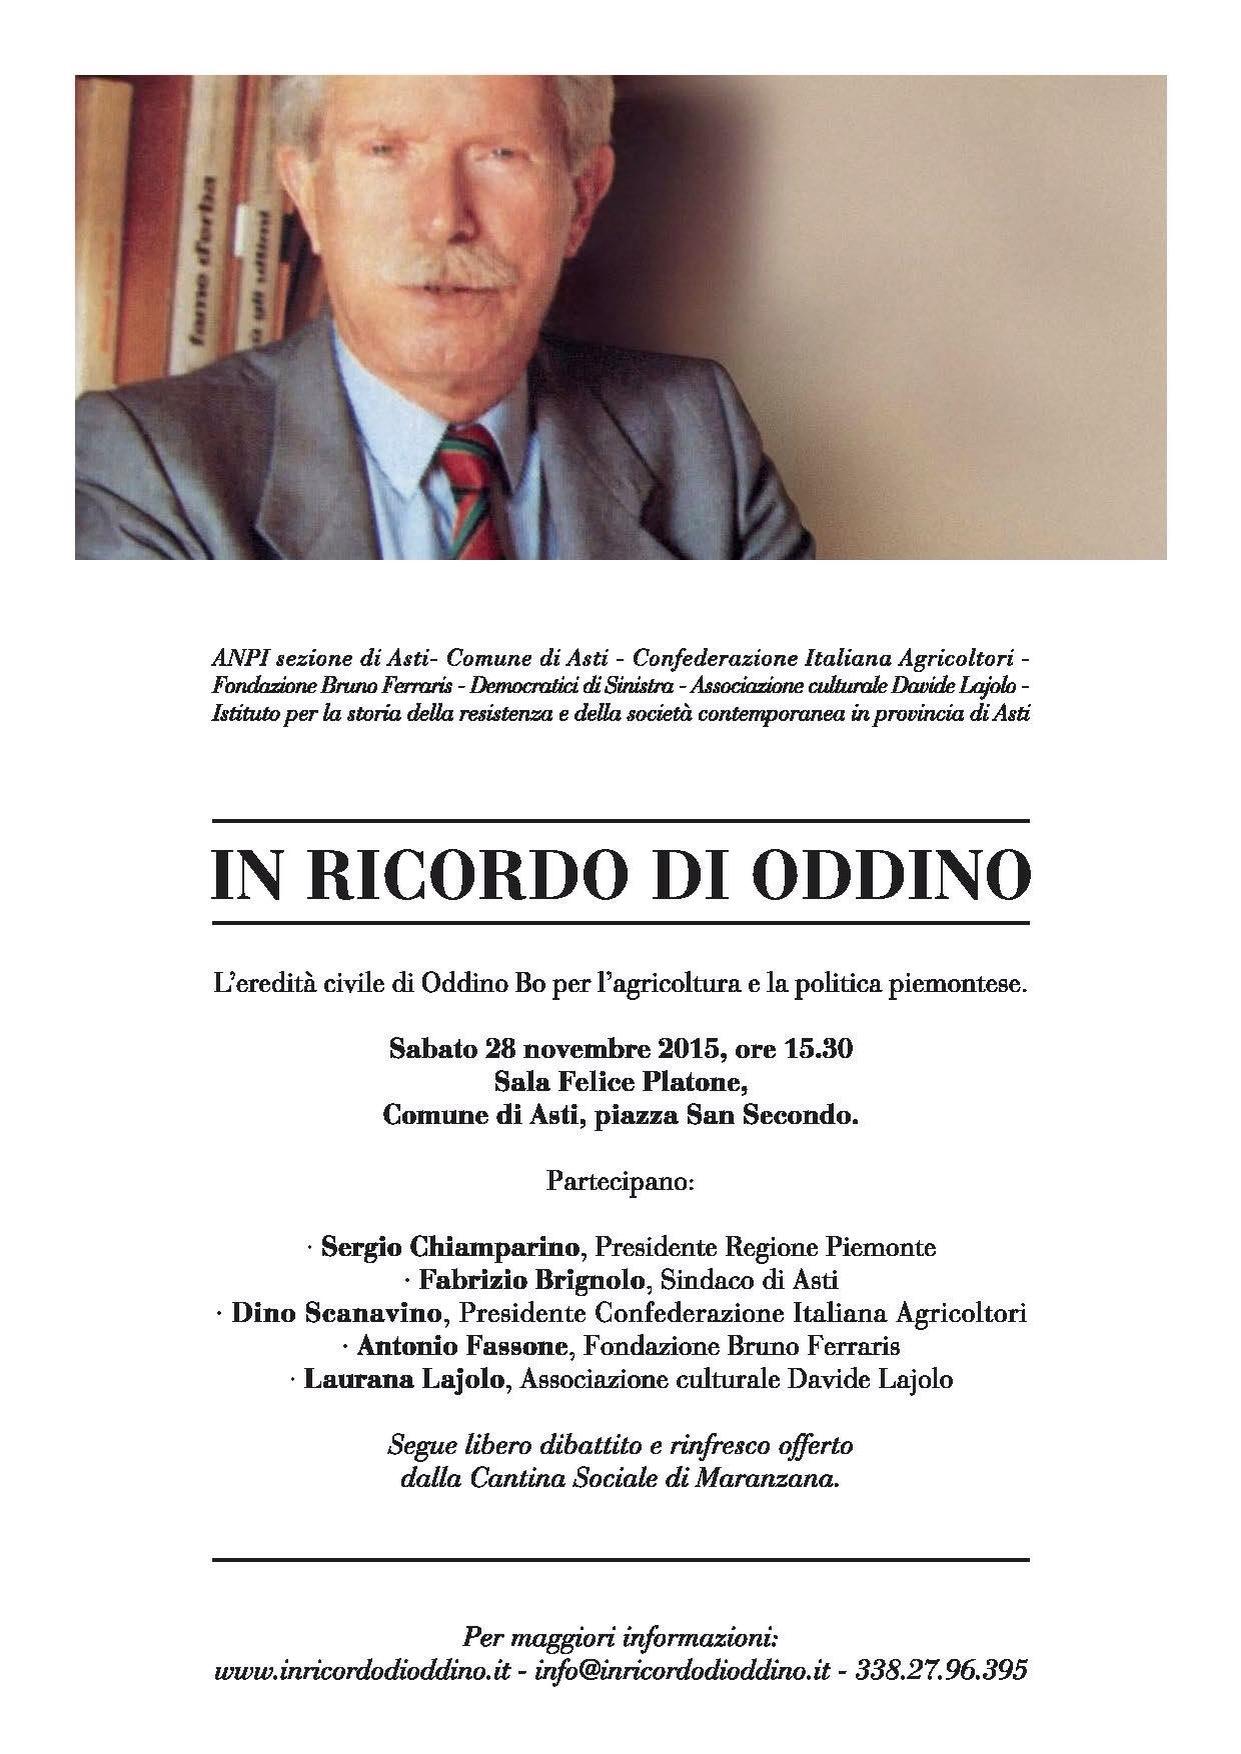 L'Israt ricorda Oddino Bo, Olga Idrame e Corrado Bianco